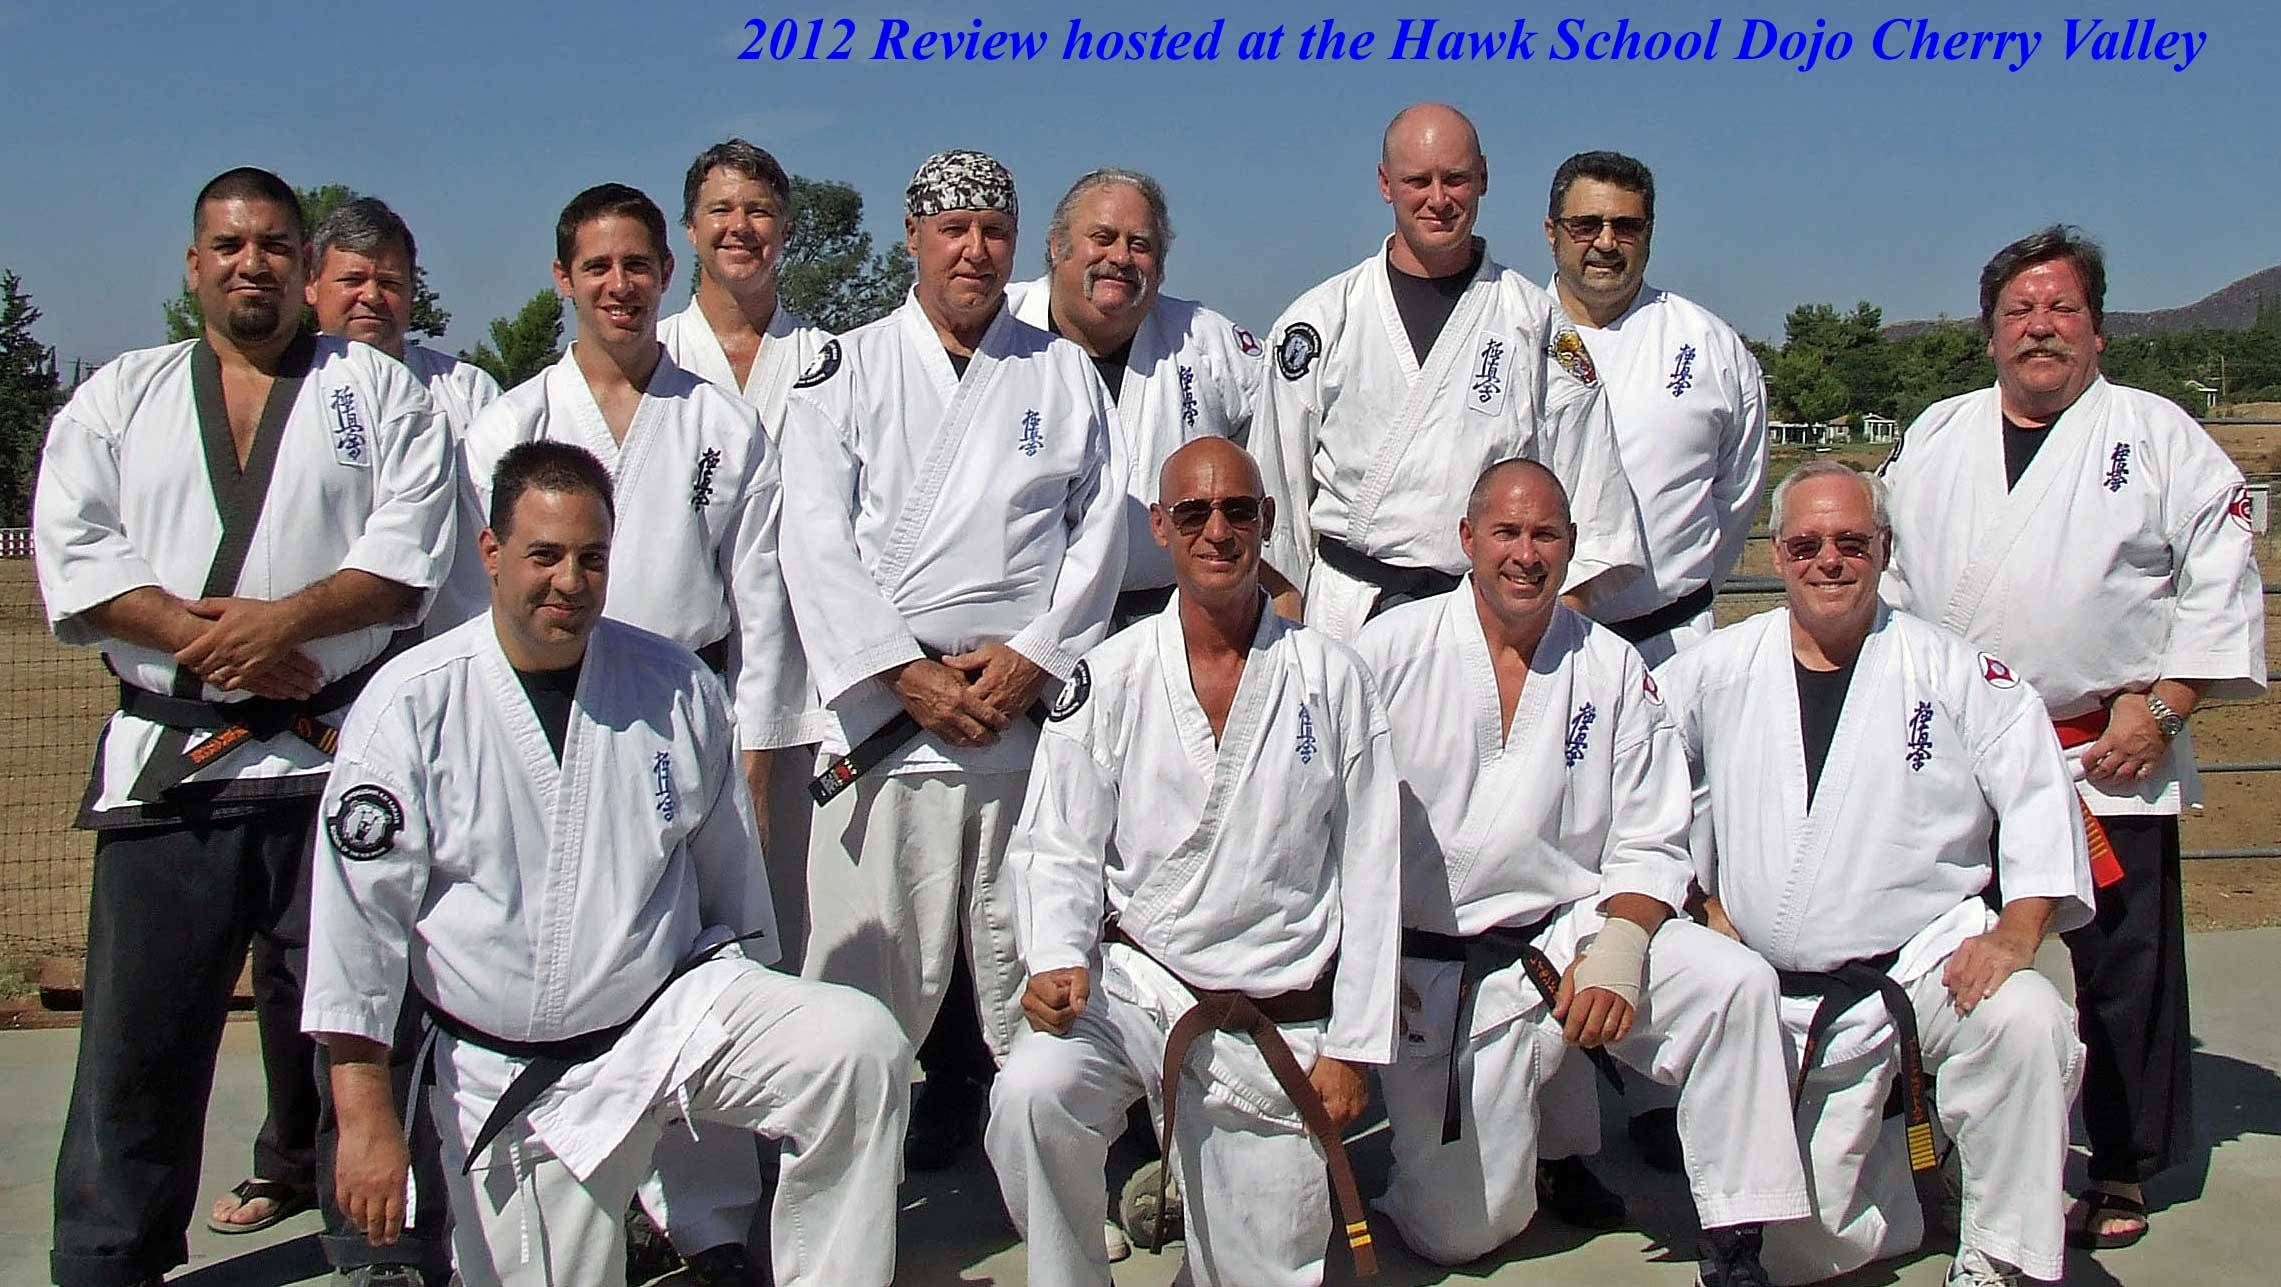 2012 Blackbelt Review at Hawl School